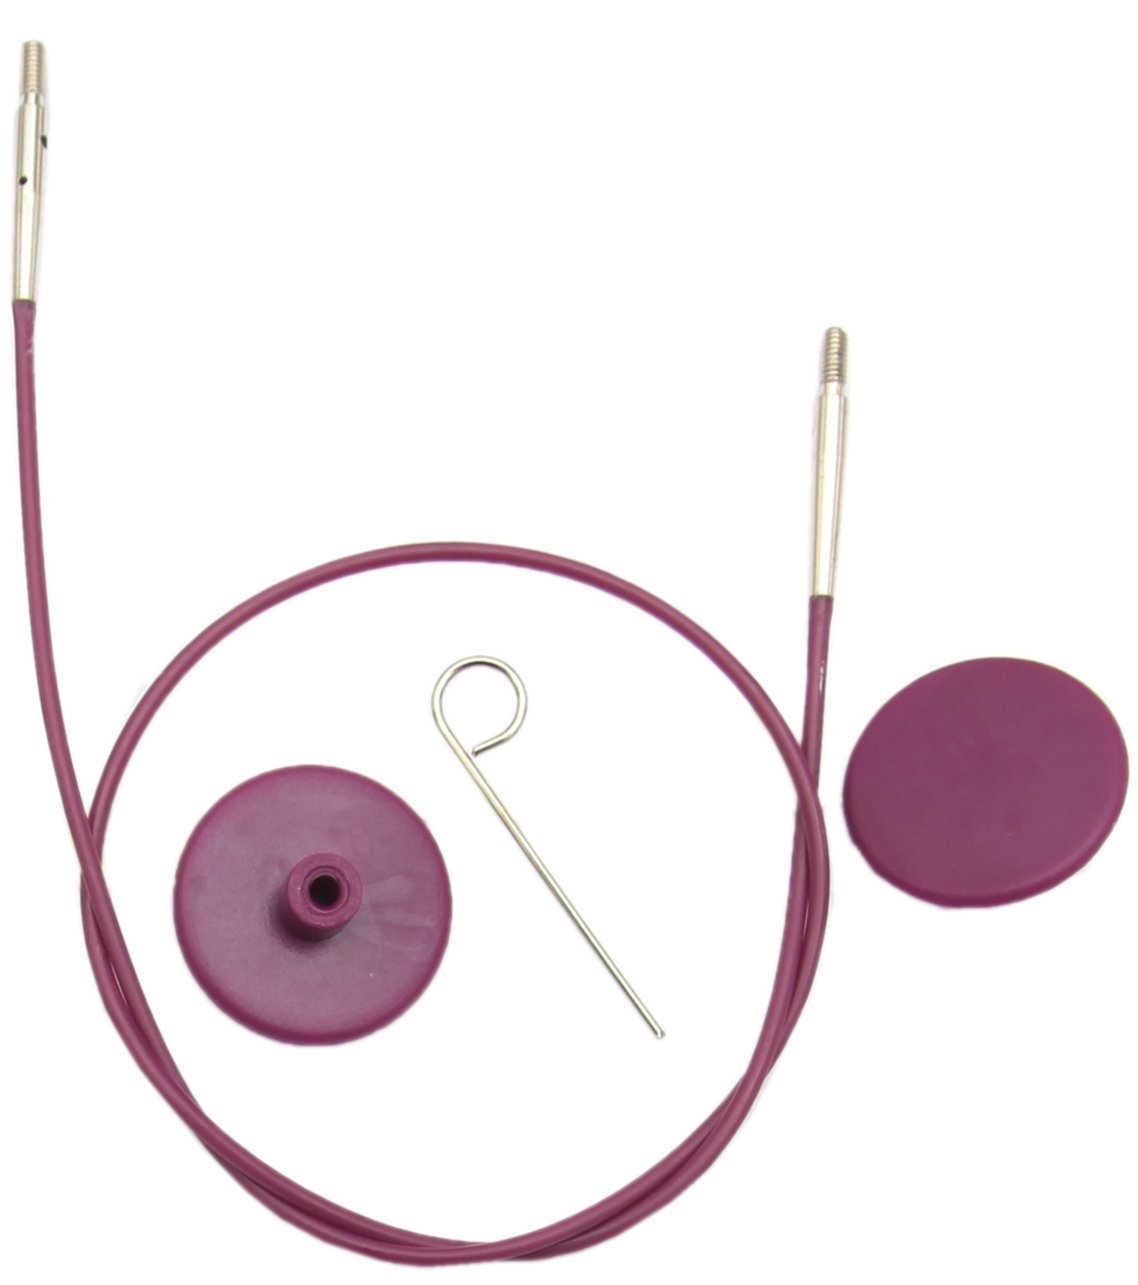 KnitPro Леска сменная Purple Silver 100 см 10503